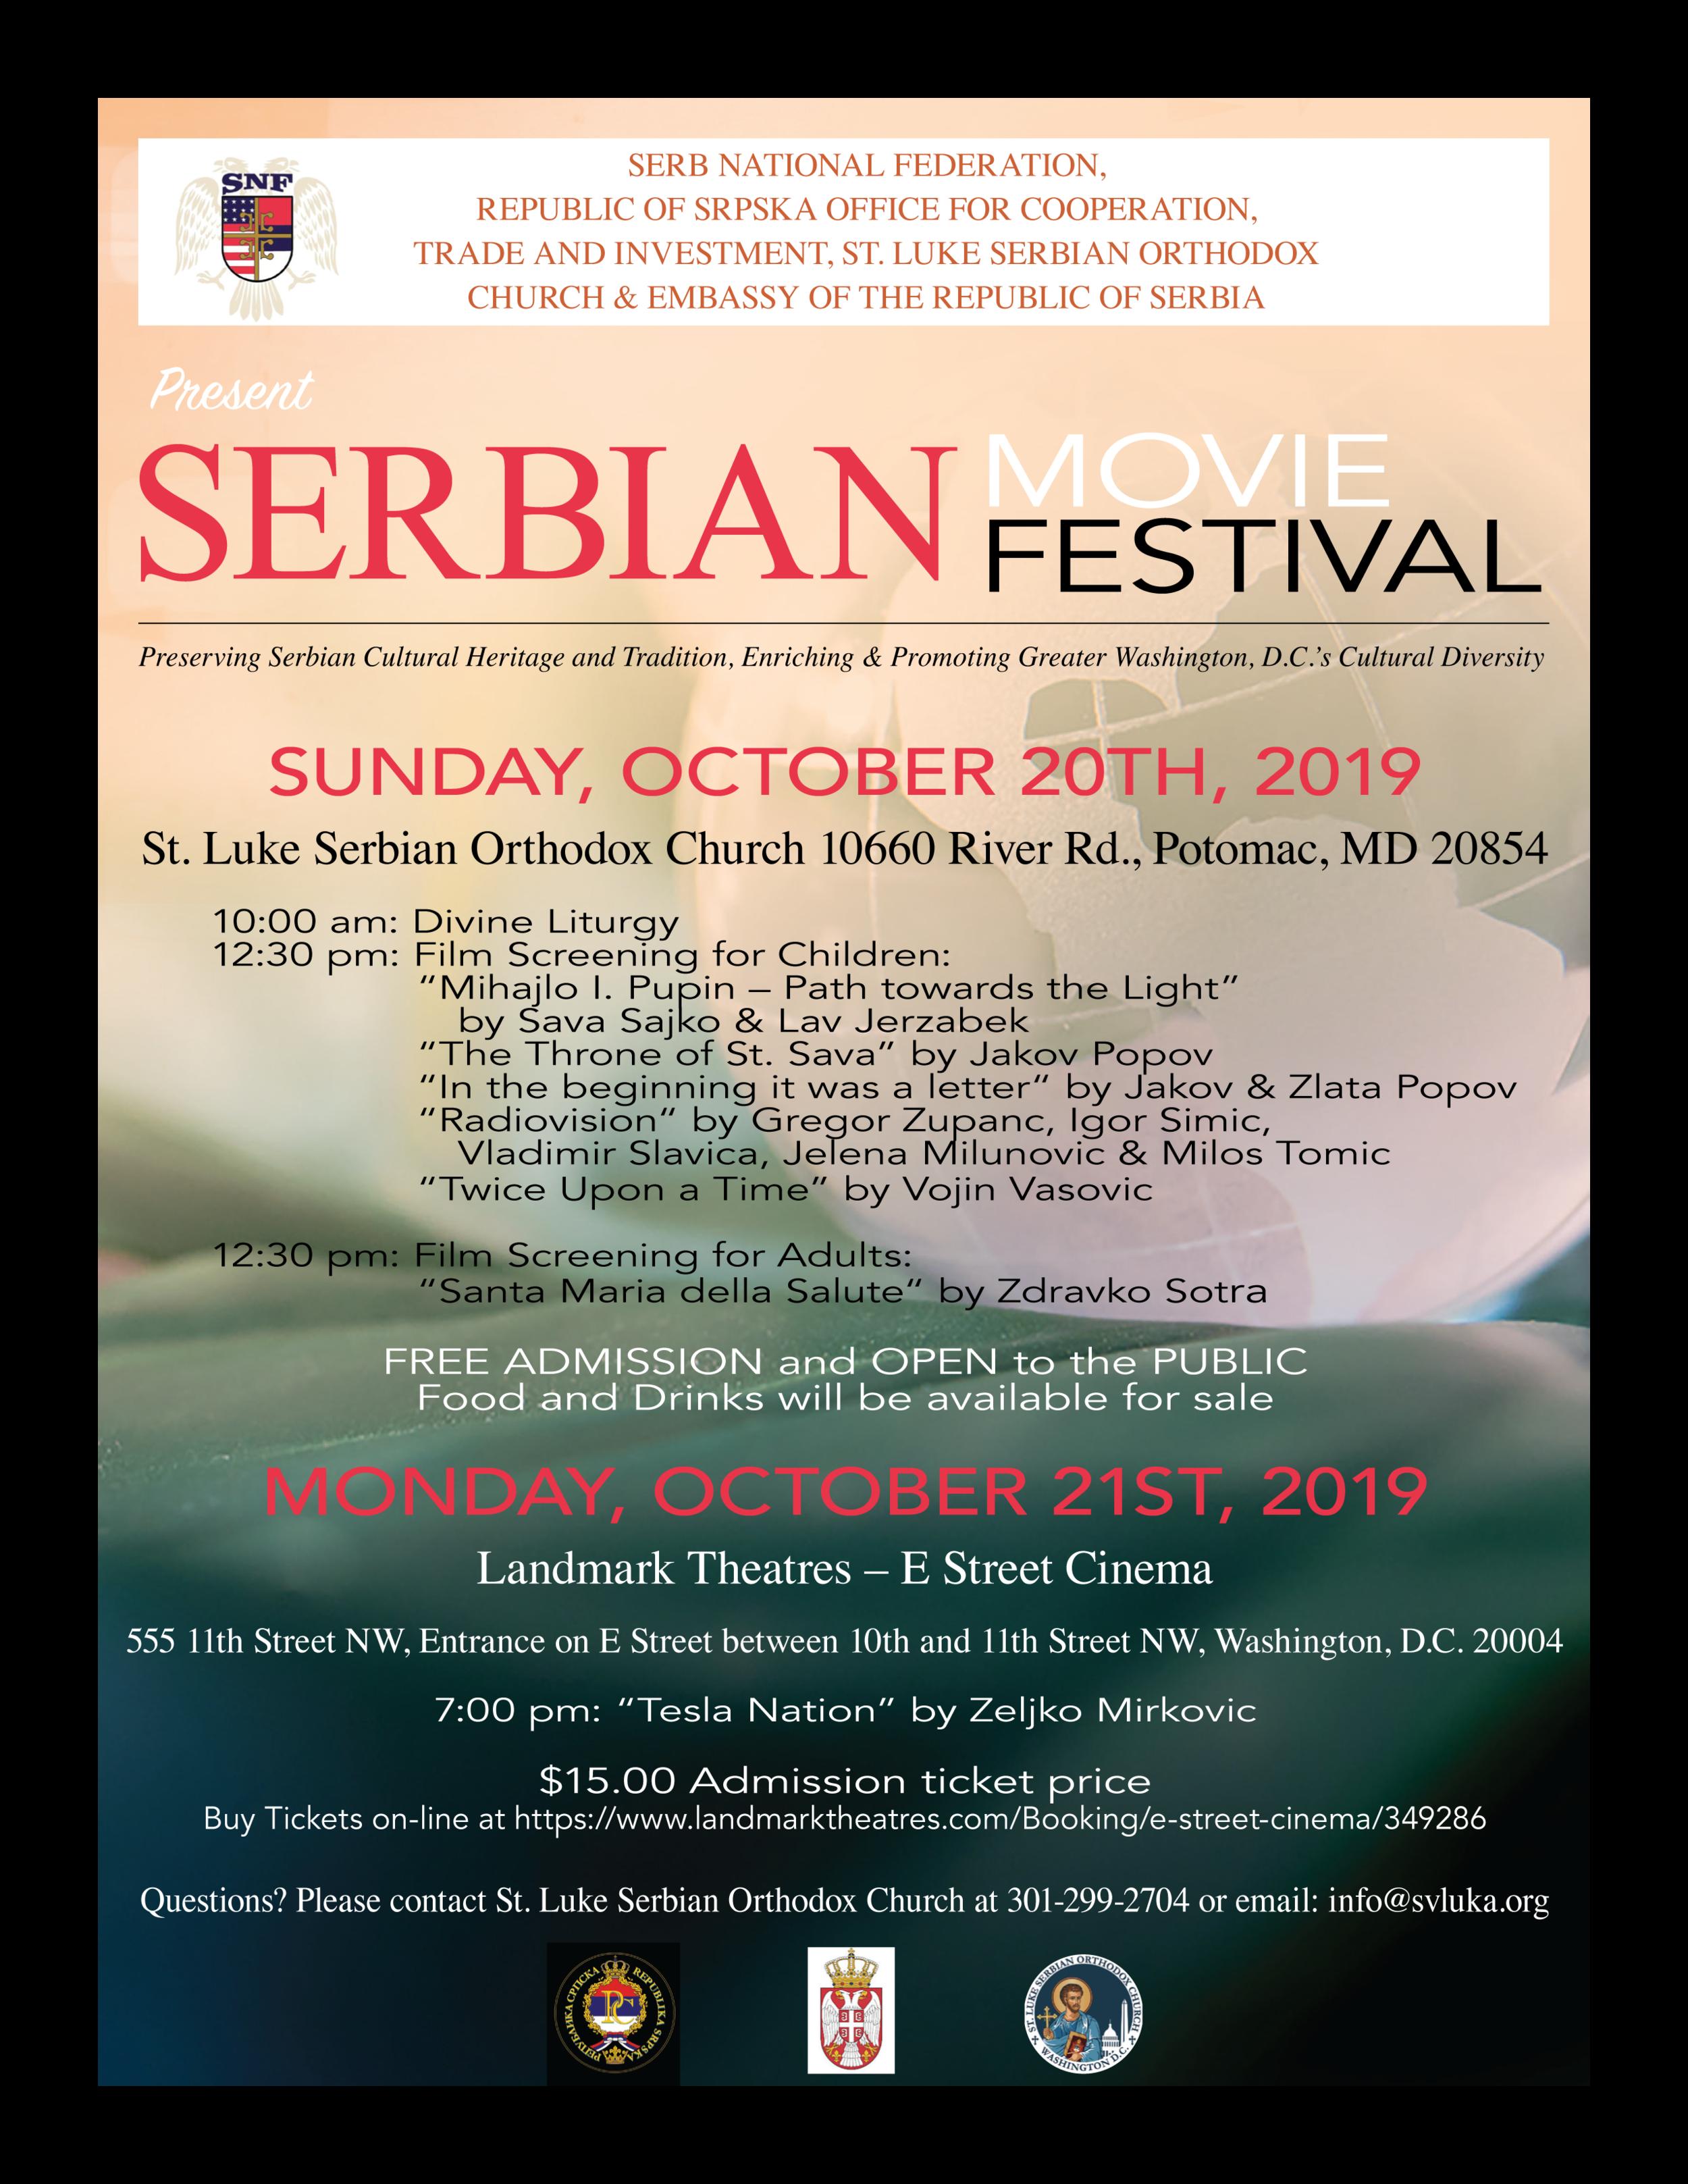 2019 Serbian Movie Festival Washington, D.C.1.png